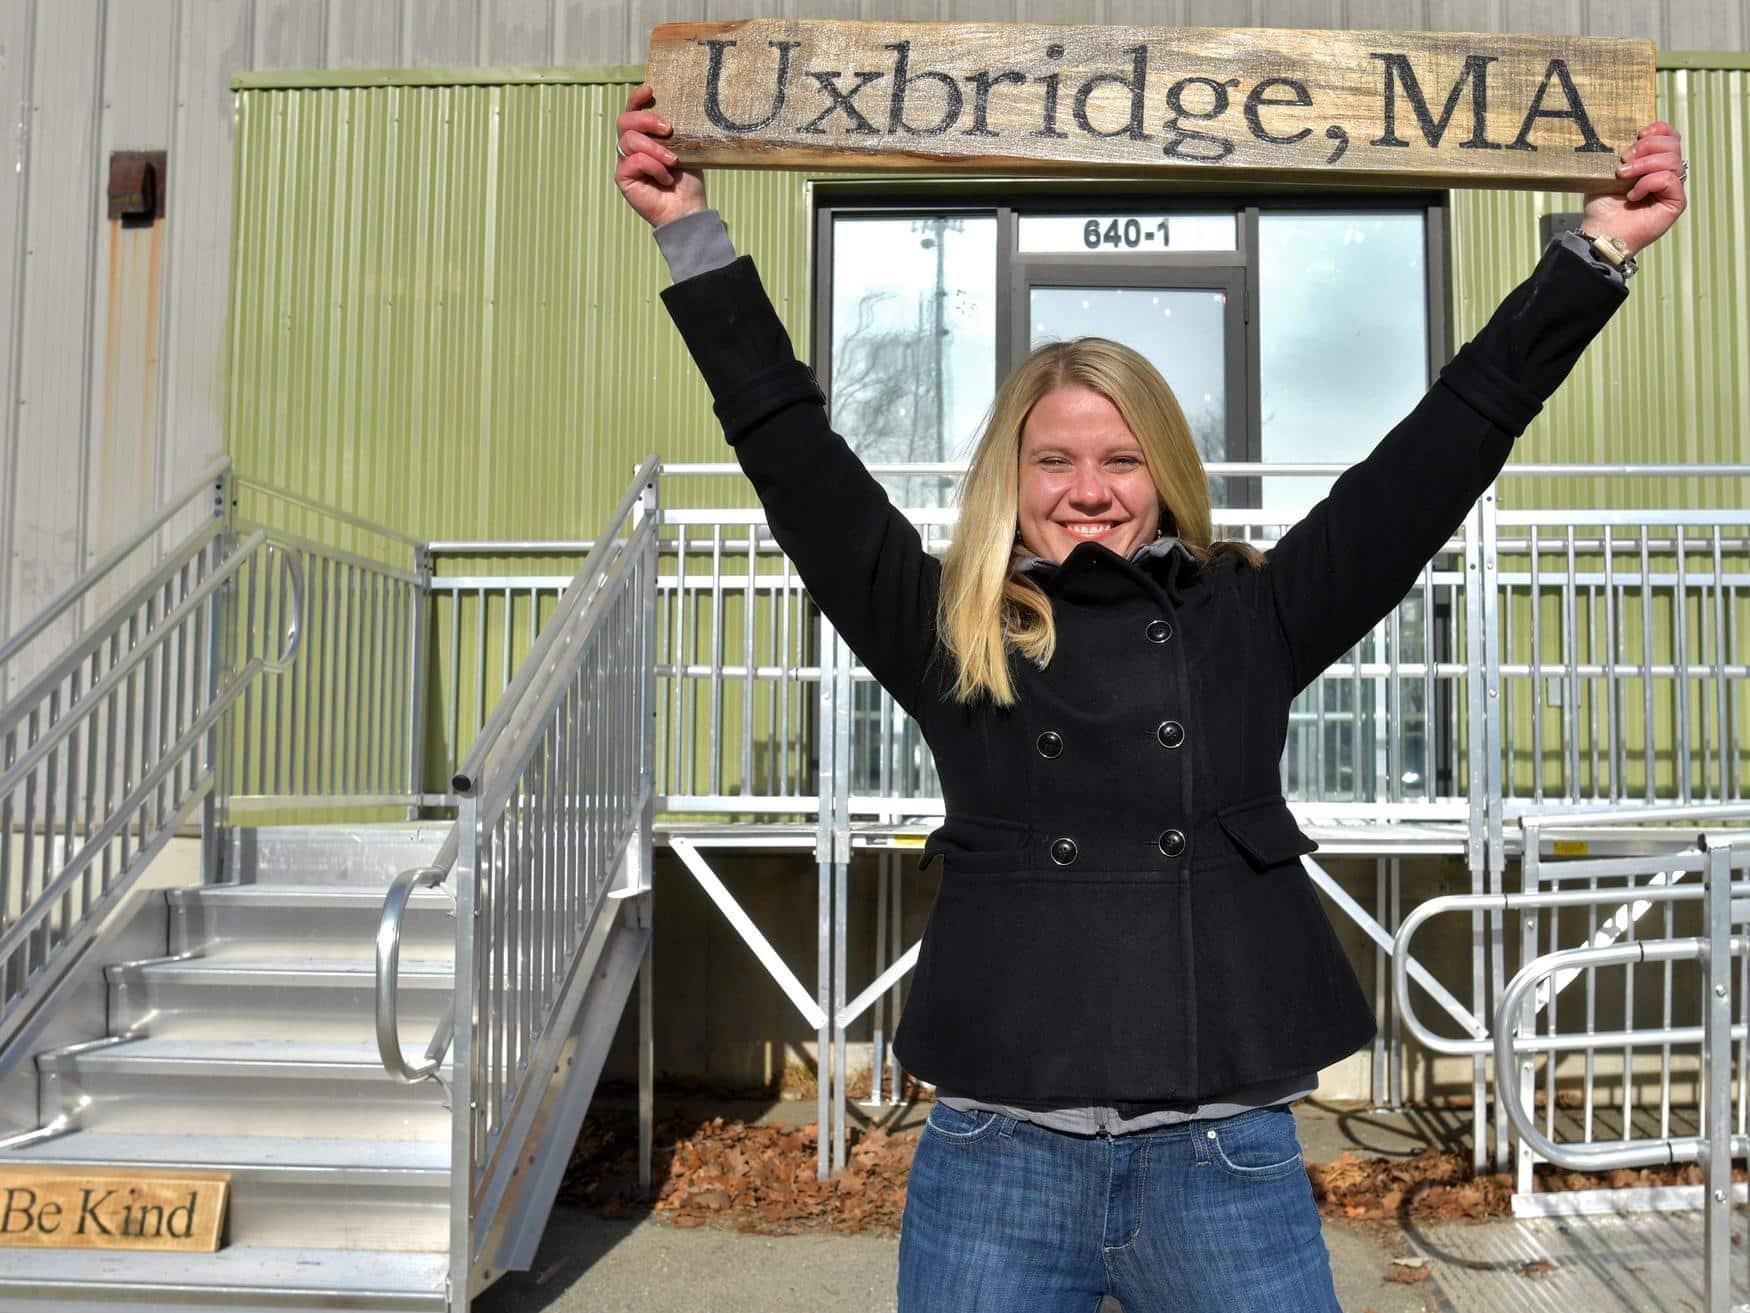 Uxbridge woman set to open cannabis boutique – News – telegram.com